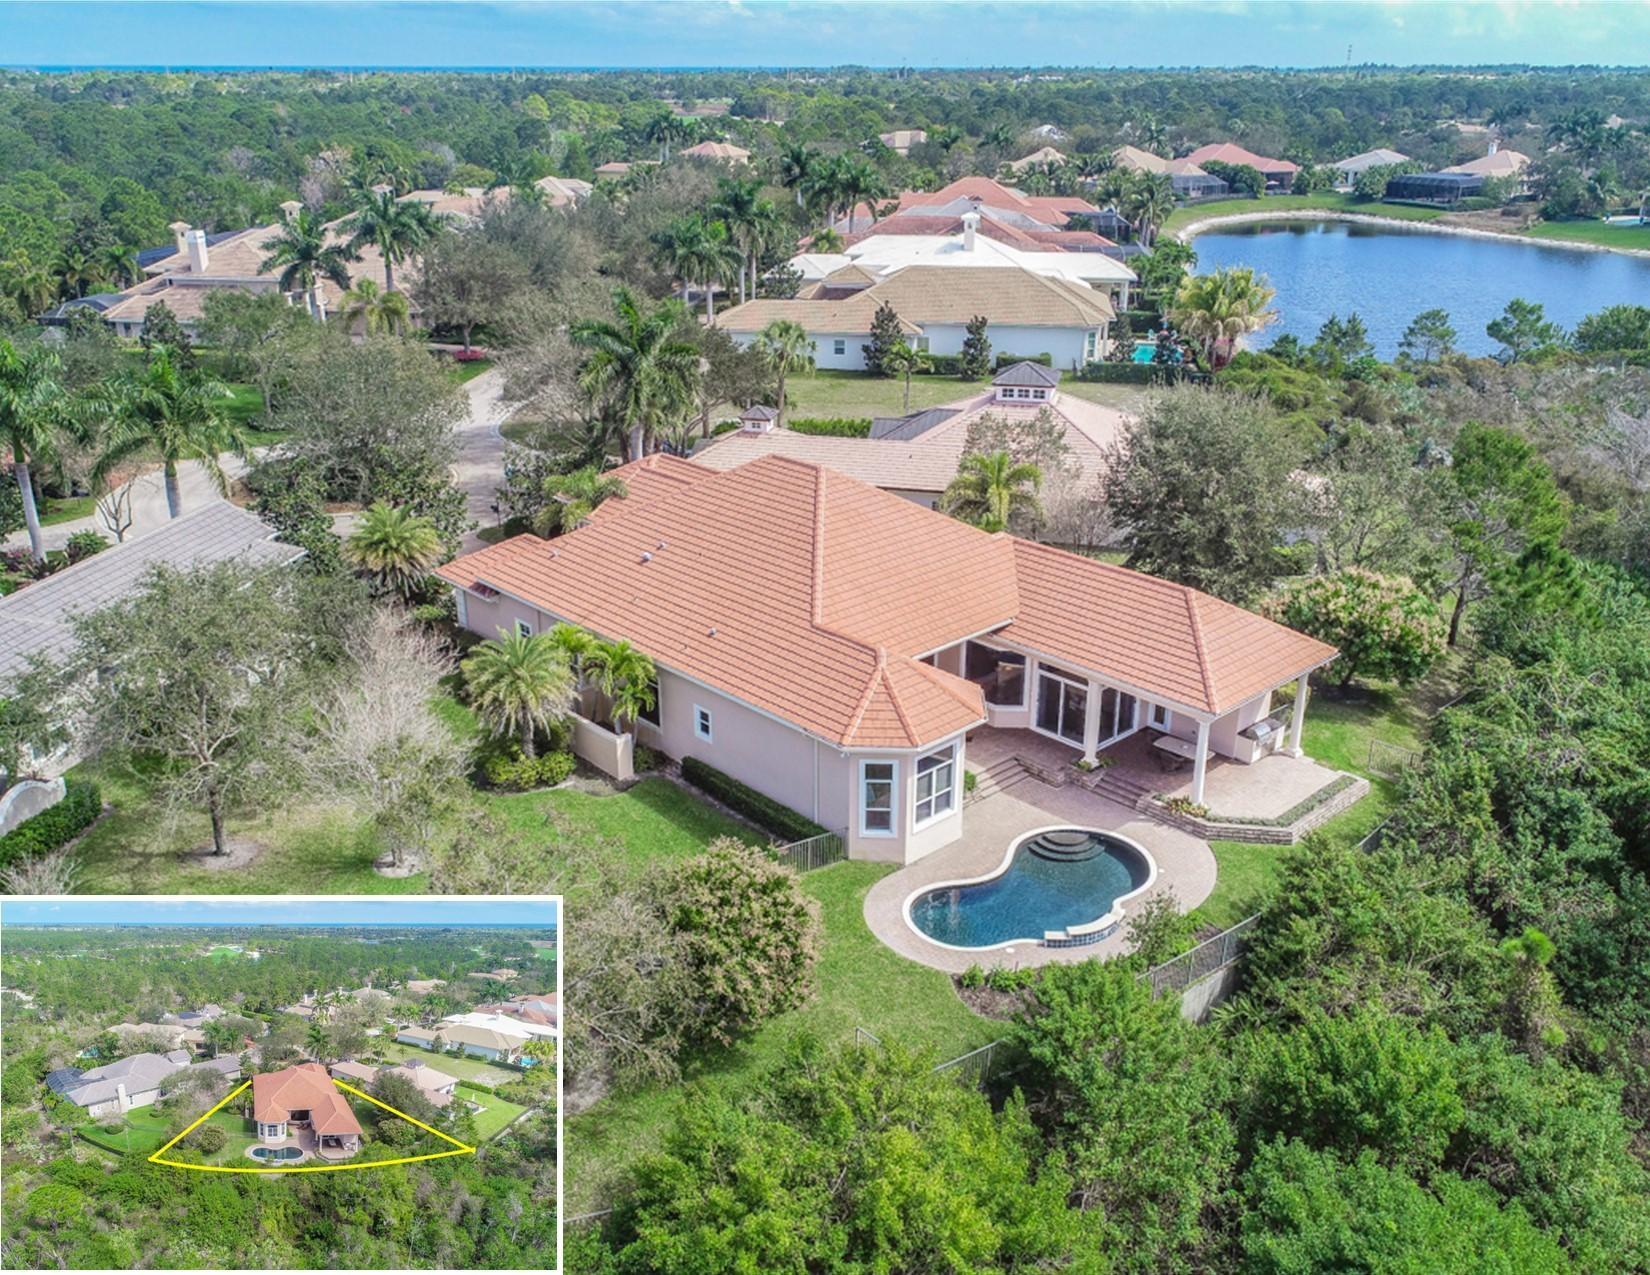 9540 Sandpine Lane, Hobe Sound, Florida 33455, 3 Bedrooms Bedrooms, ,4.1 BathroomsBathrooms,A,Single family,Sandpine,RX-10509083